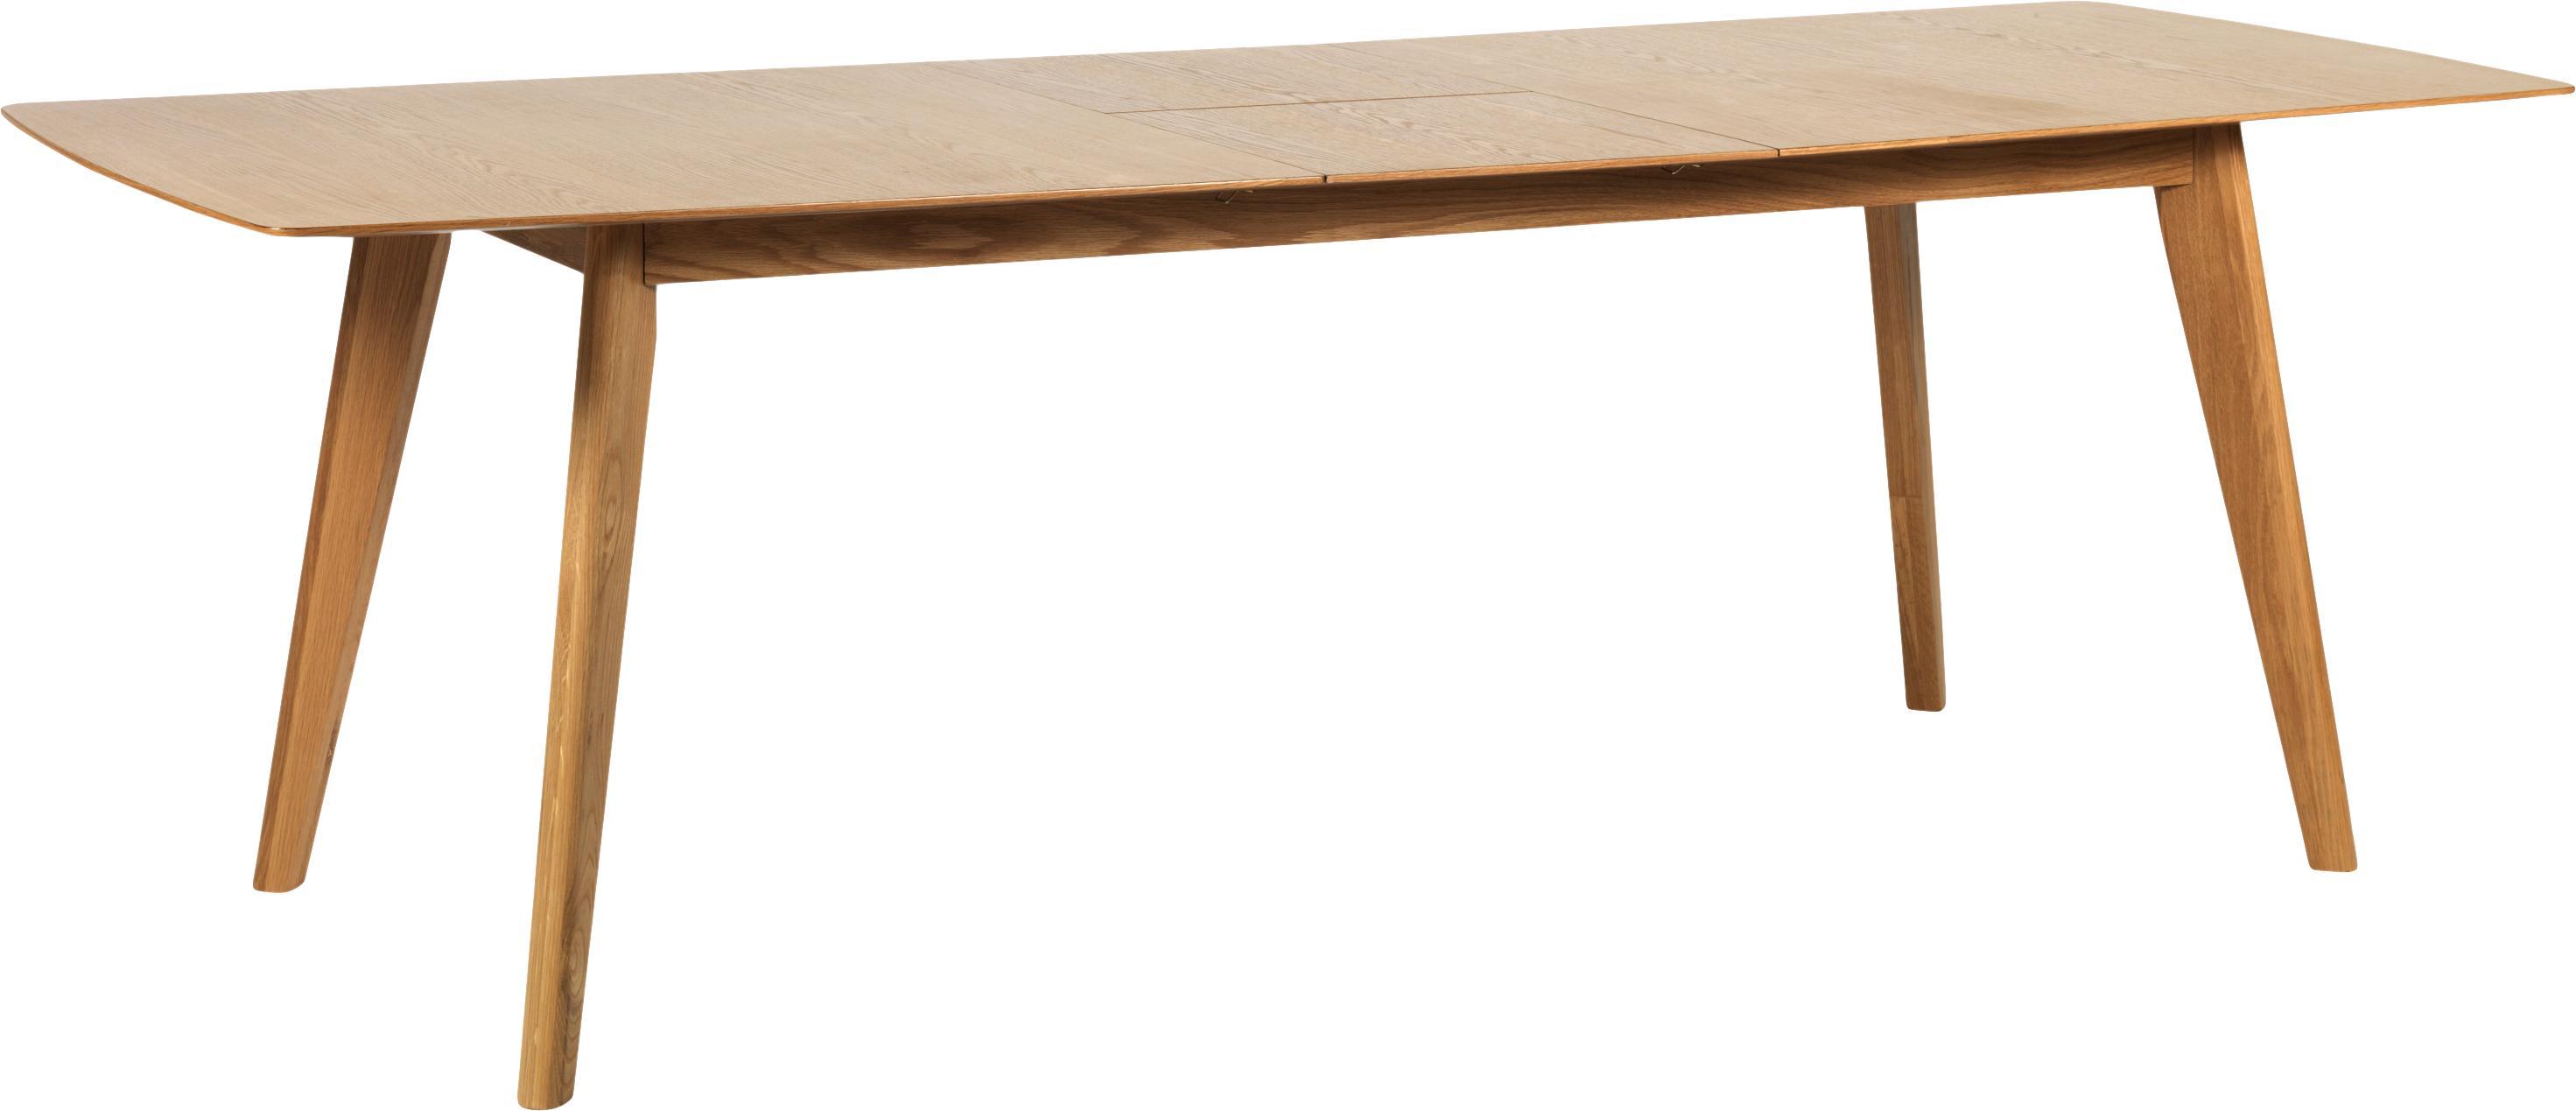 Mesa de comedor extensible en roble Cirrus, Tablero: fibras de densidad media , Patas: madera de roble, lacado c, Roble mate, An 190-235 x F 90 cm